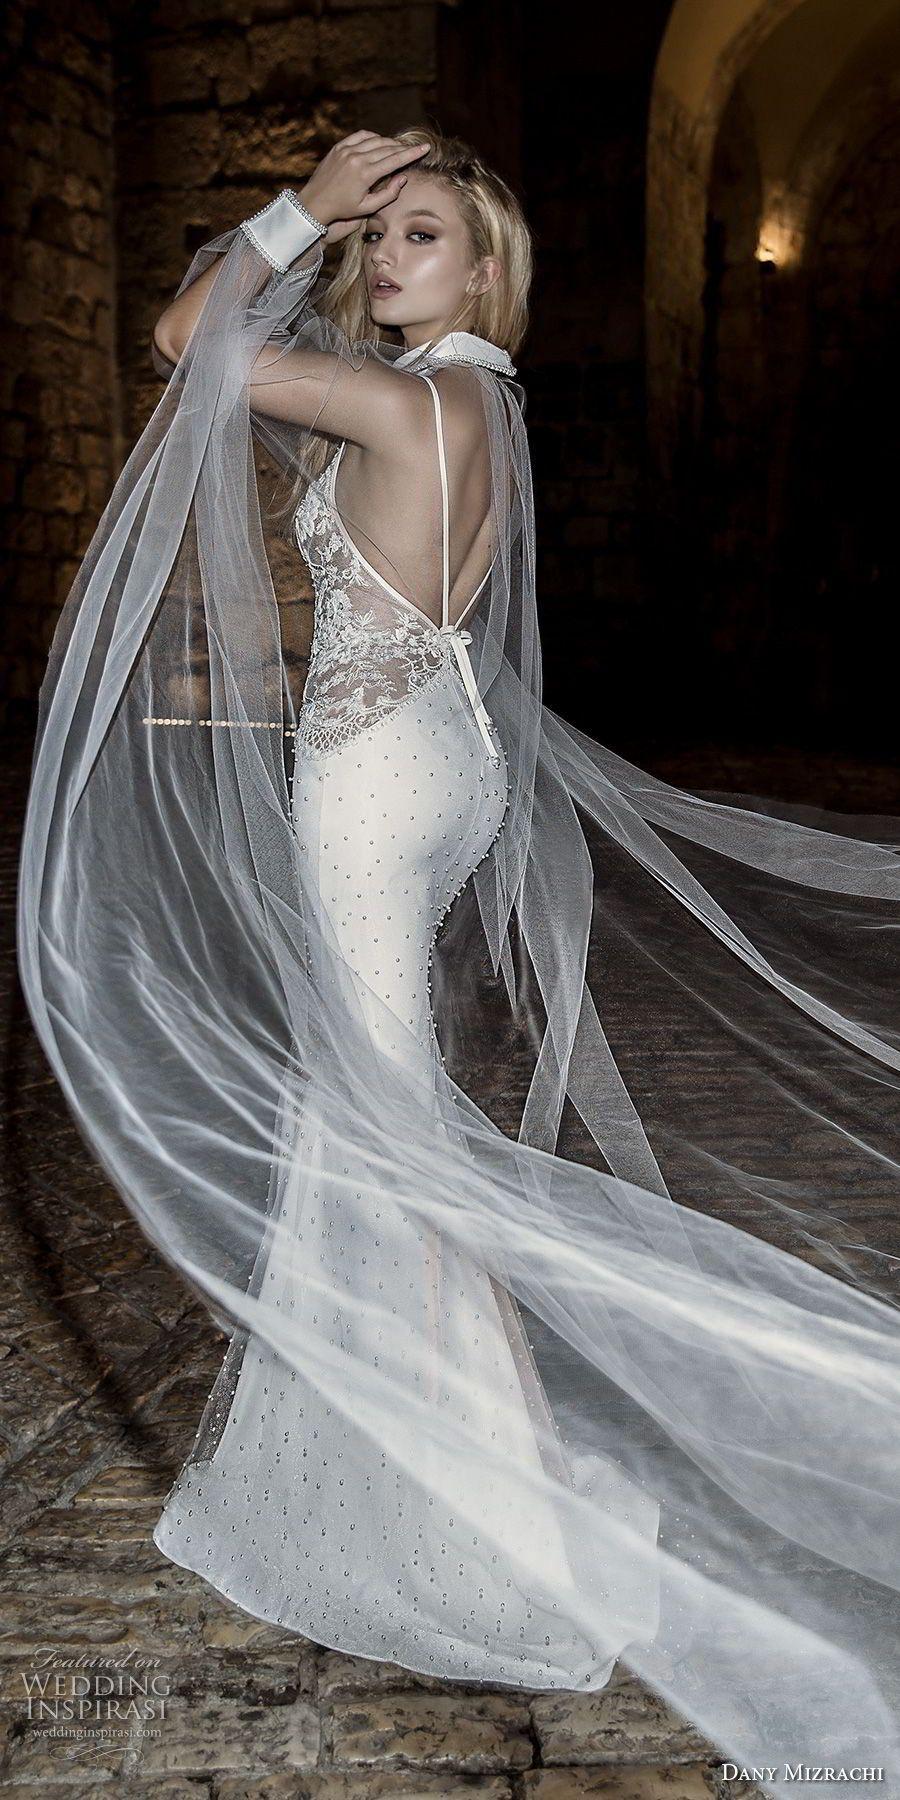 Elegant mermaid wedding dresses  Dany Mizrachi Spring  Wedding Dresses u ucJerusalemud Bridal